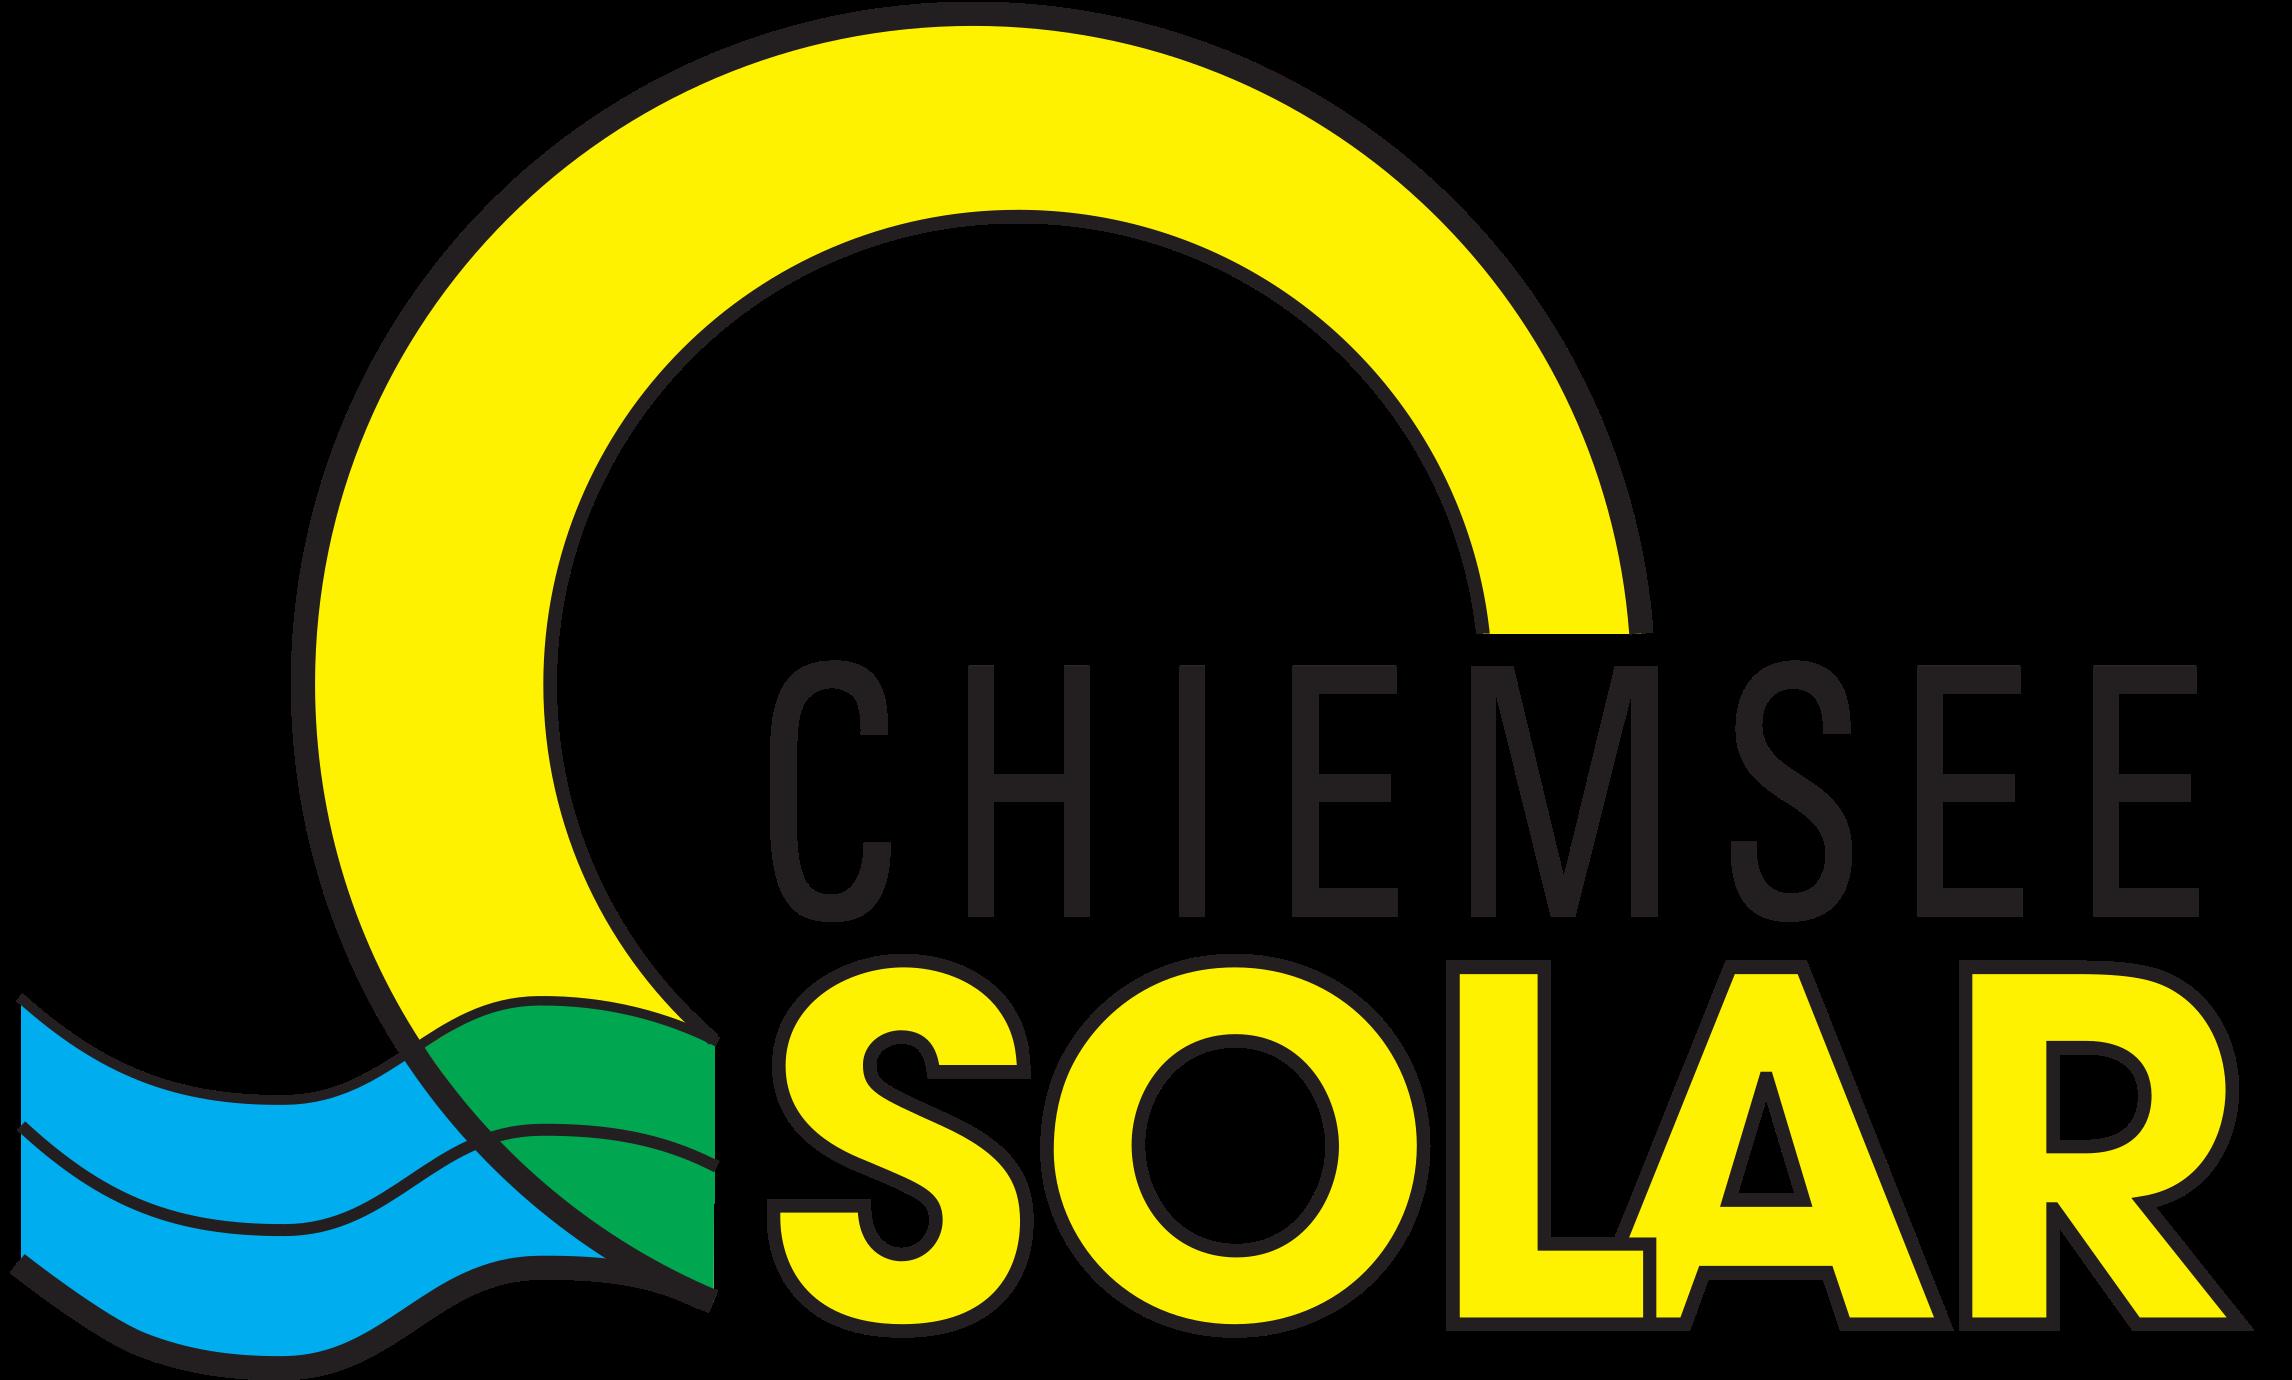 Chiemsee Solar